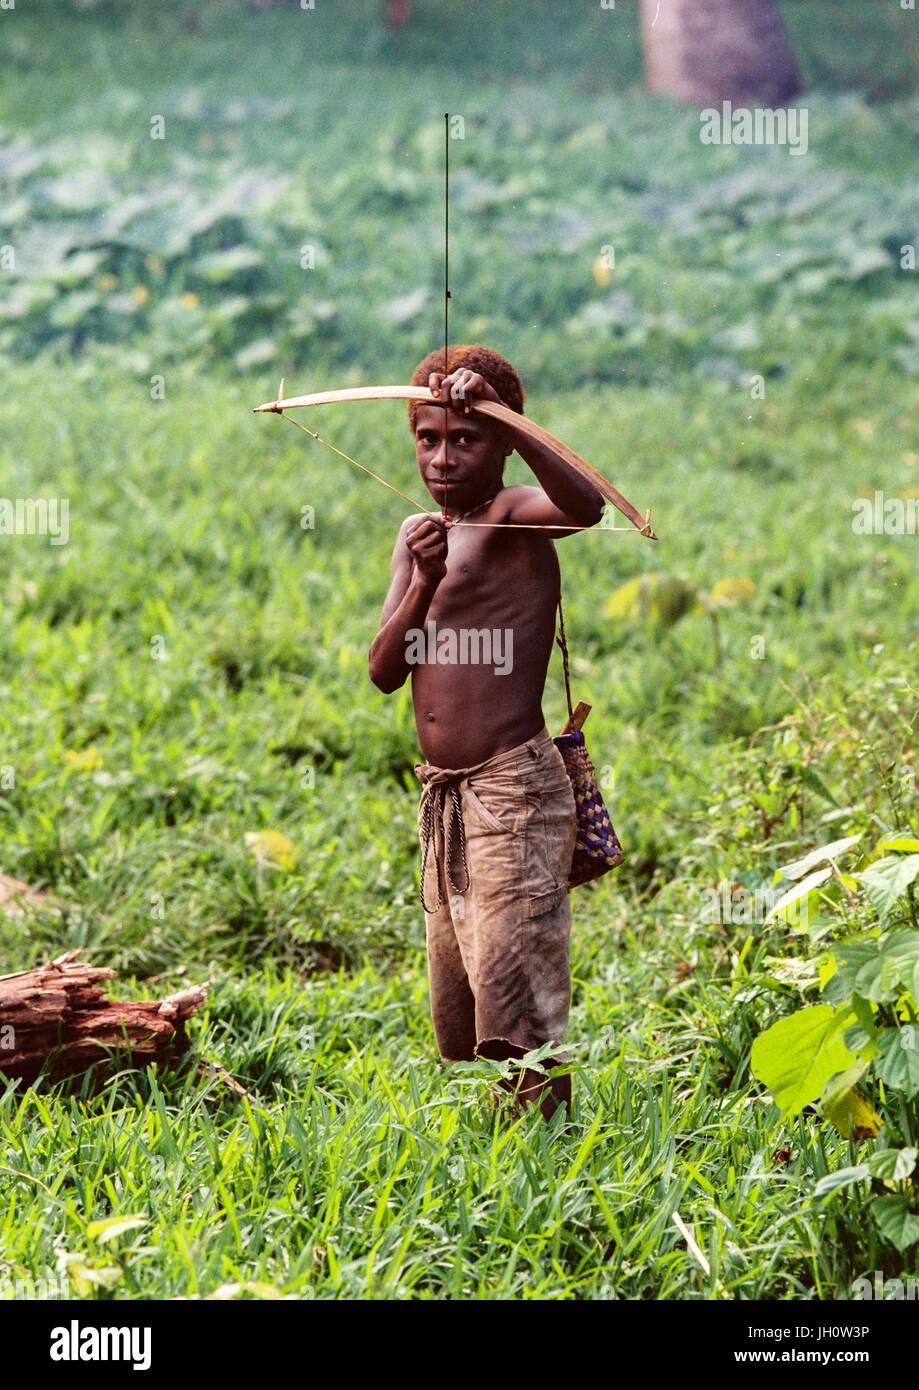 Portrait of a boy hunting with a bow, Malampa Province, Malekula Island, Vanuatu - Stock Image